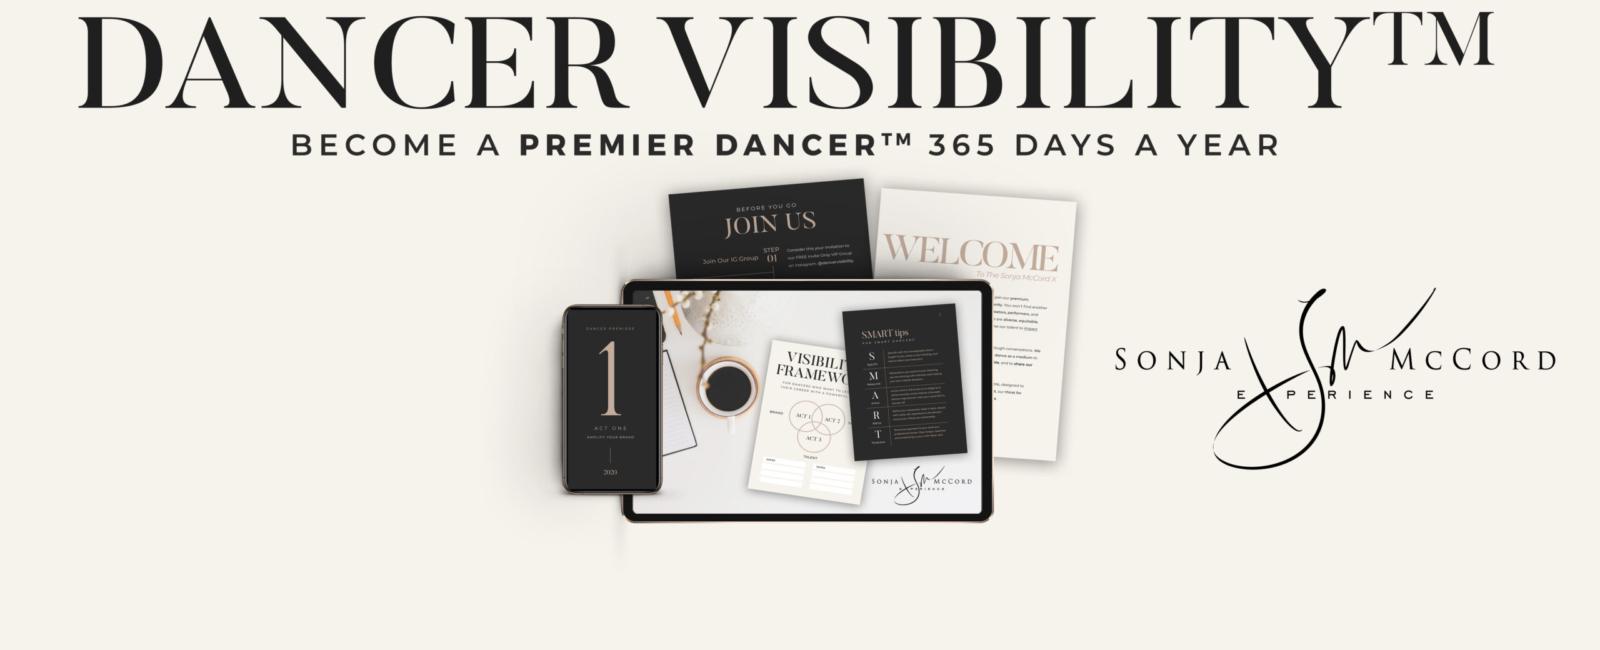 dancer-visibility-intensive